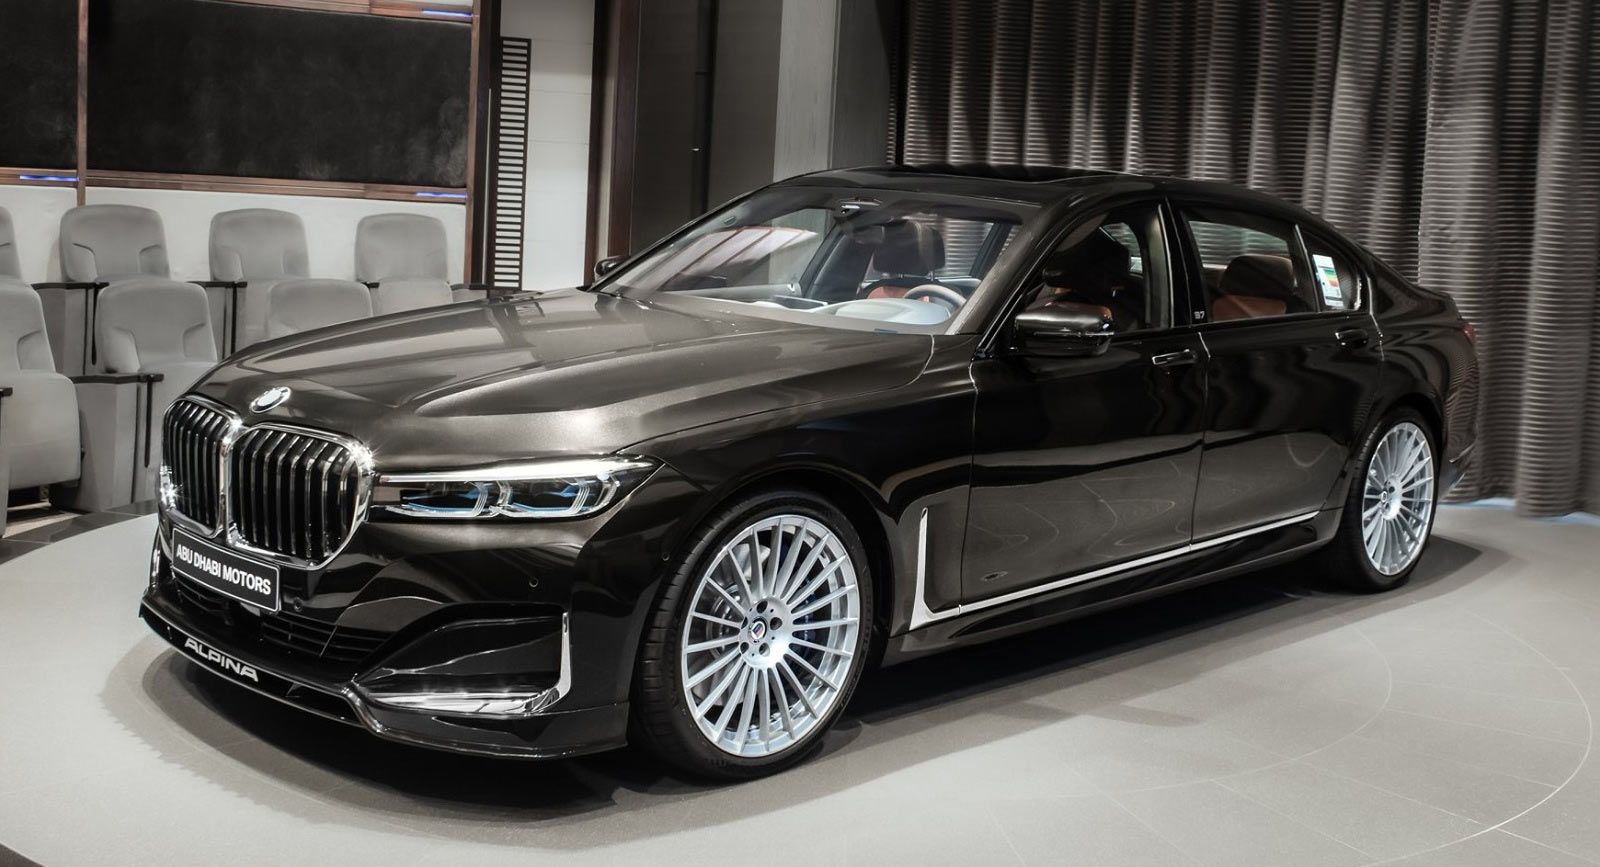 2020 Alpina B7 Looks Understated Thanks To Citrin Black Exterior